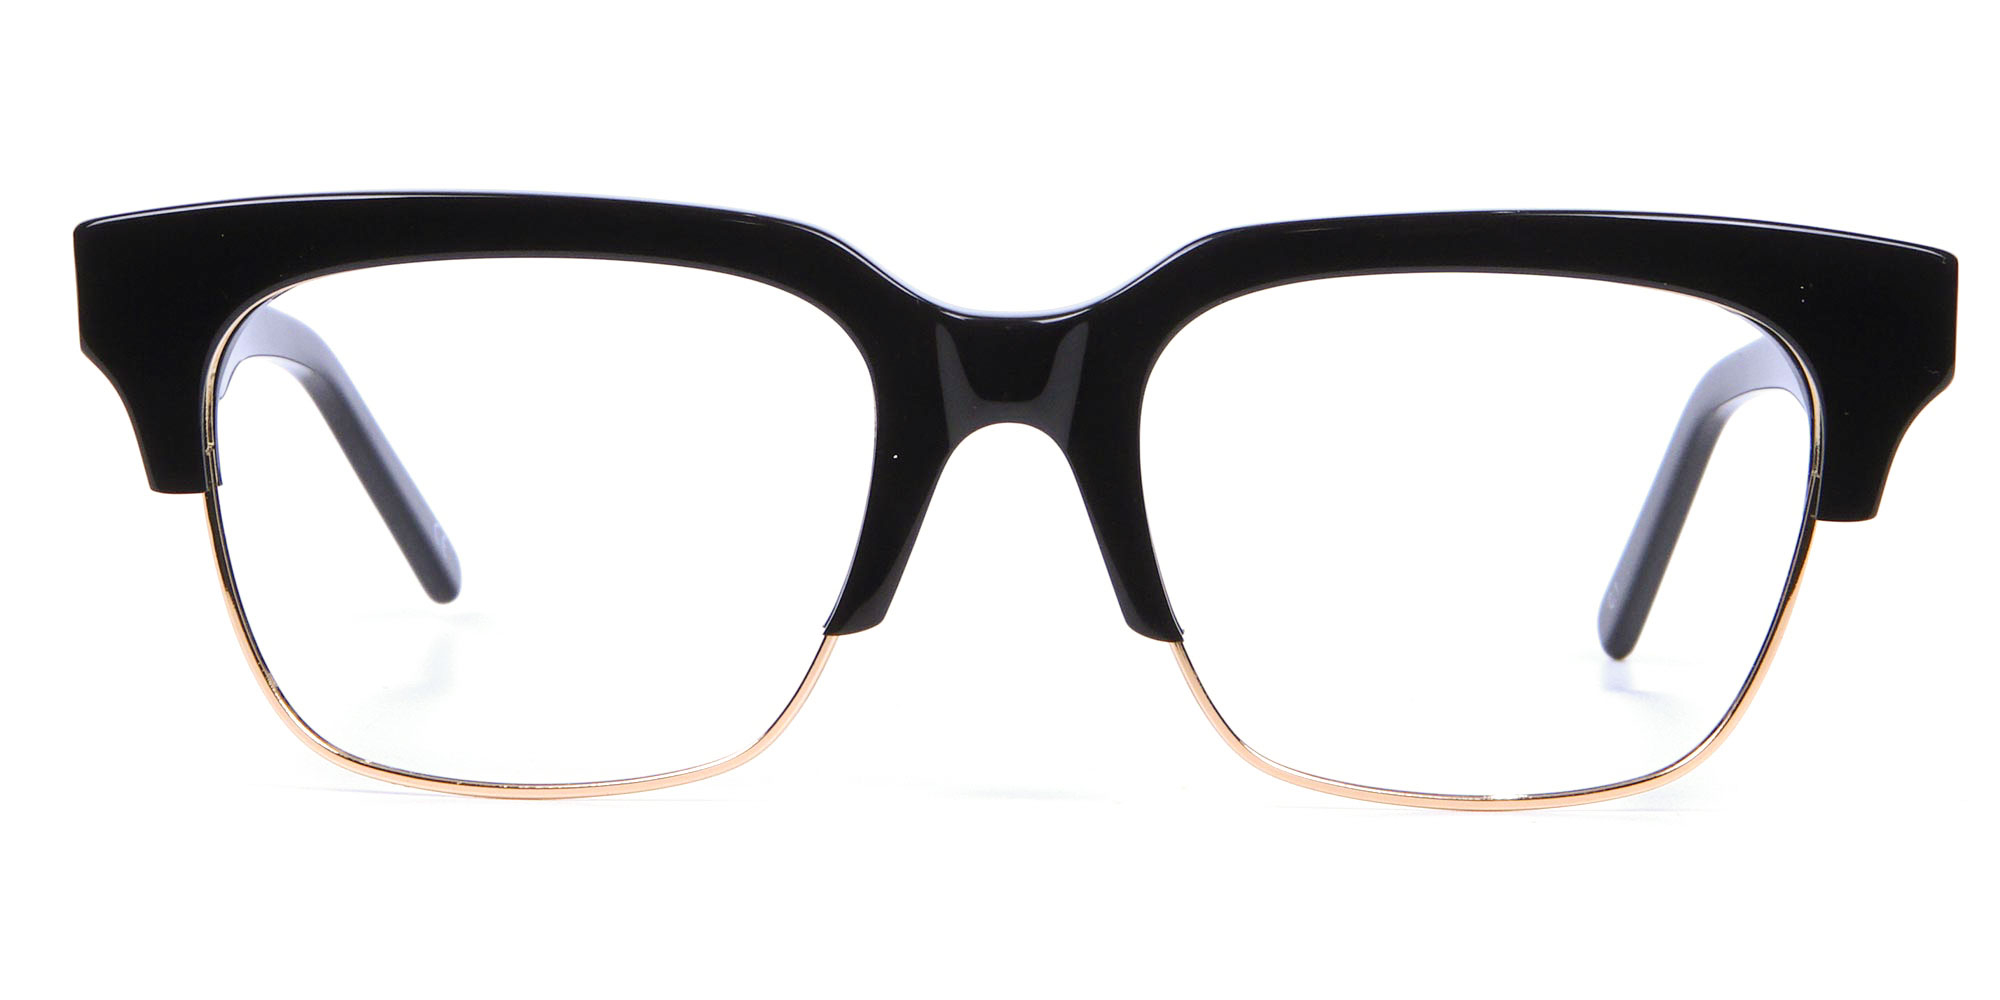 90's Inspired Vintage Black hipster glasses